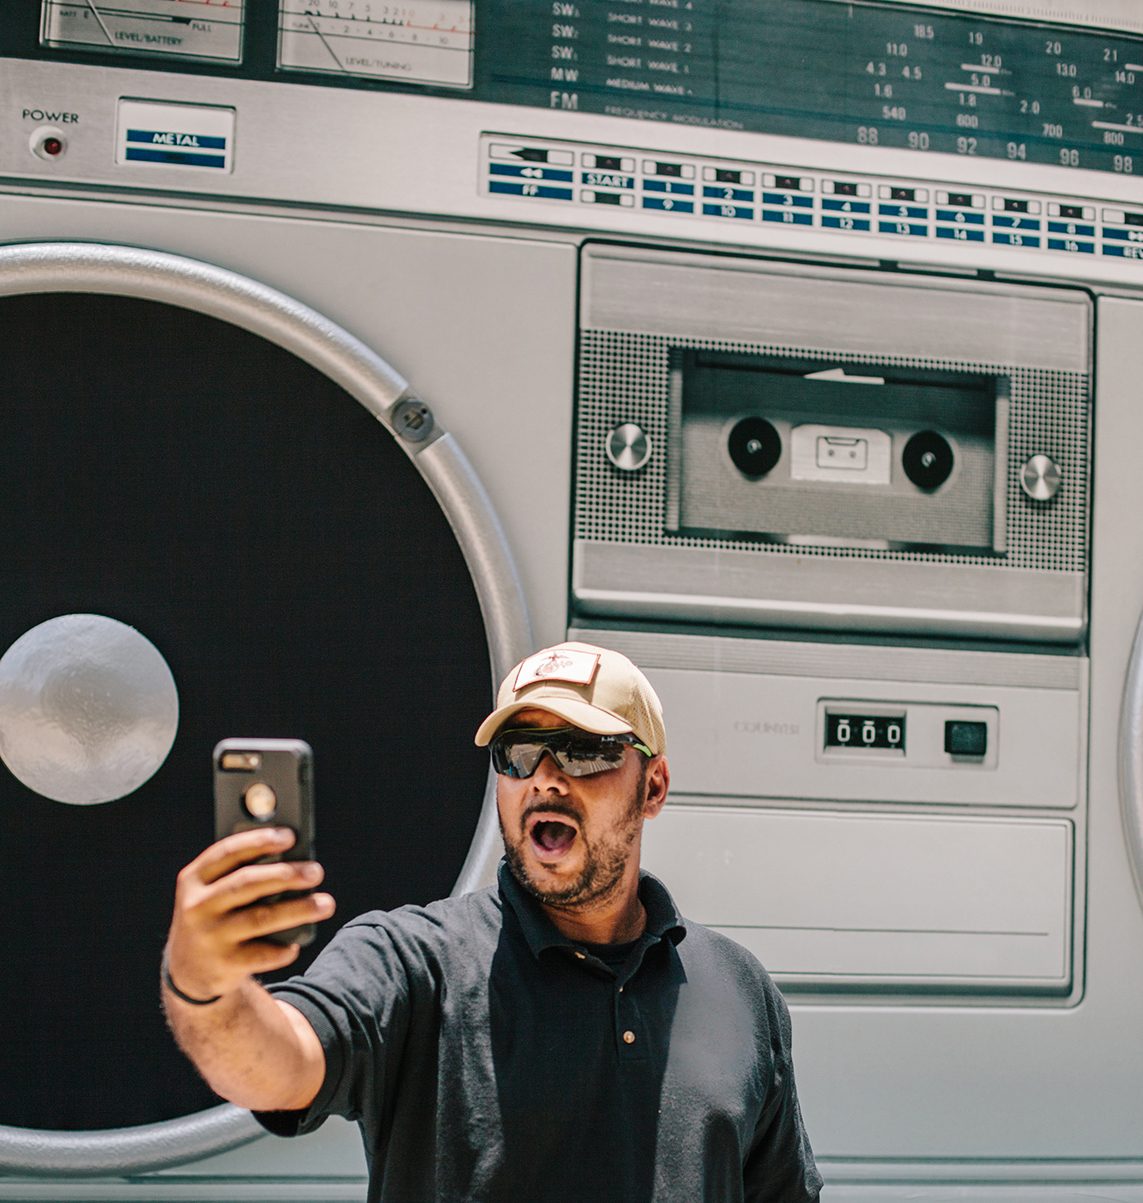 005 Silverpeak Boombox Selfie